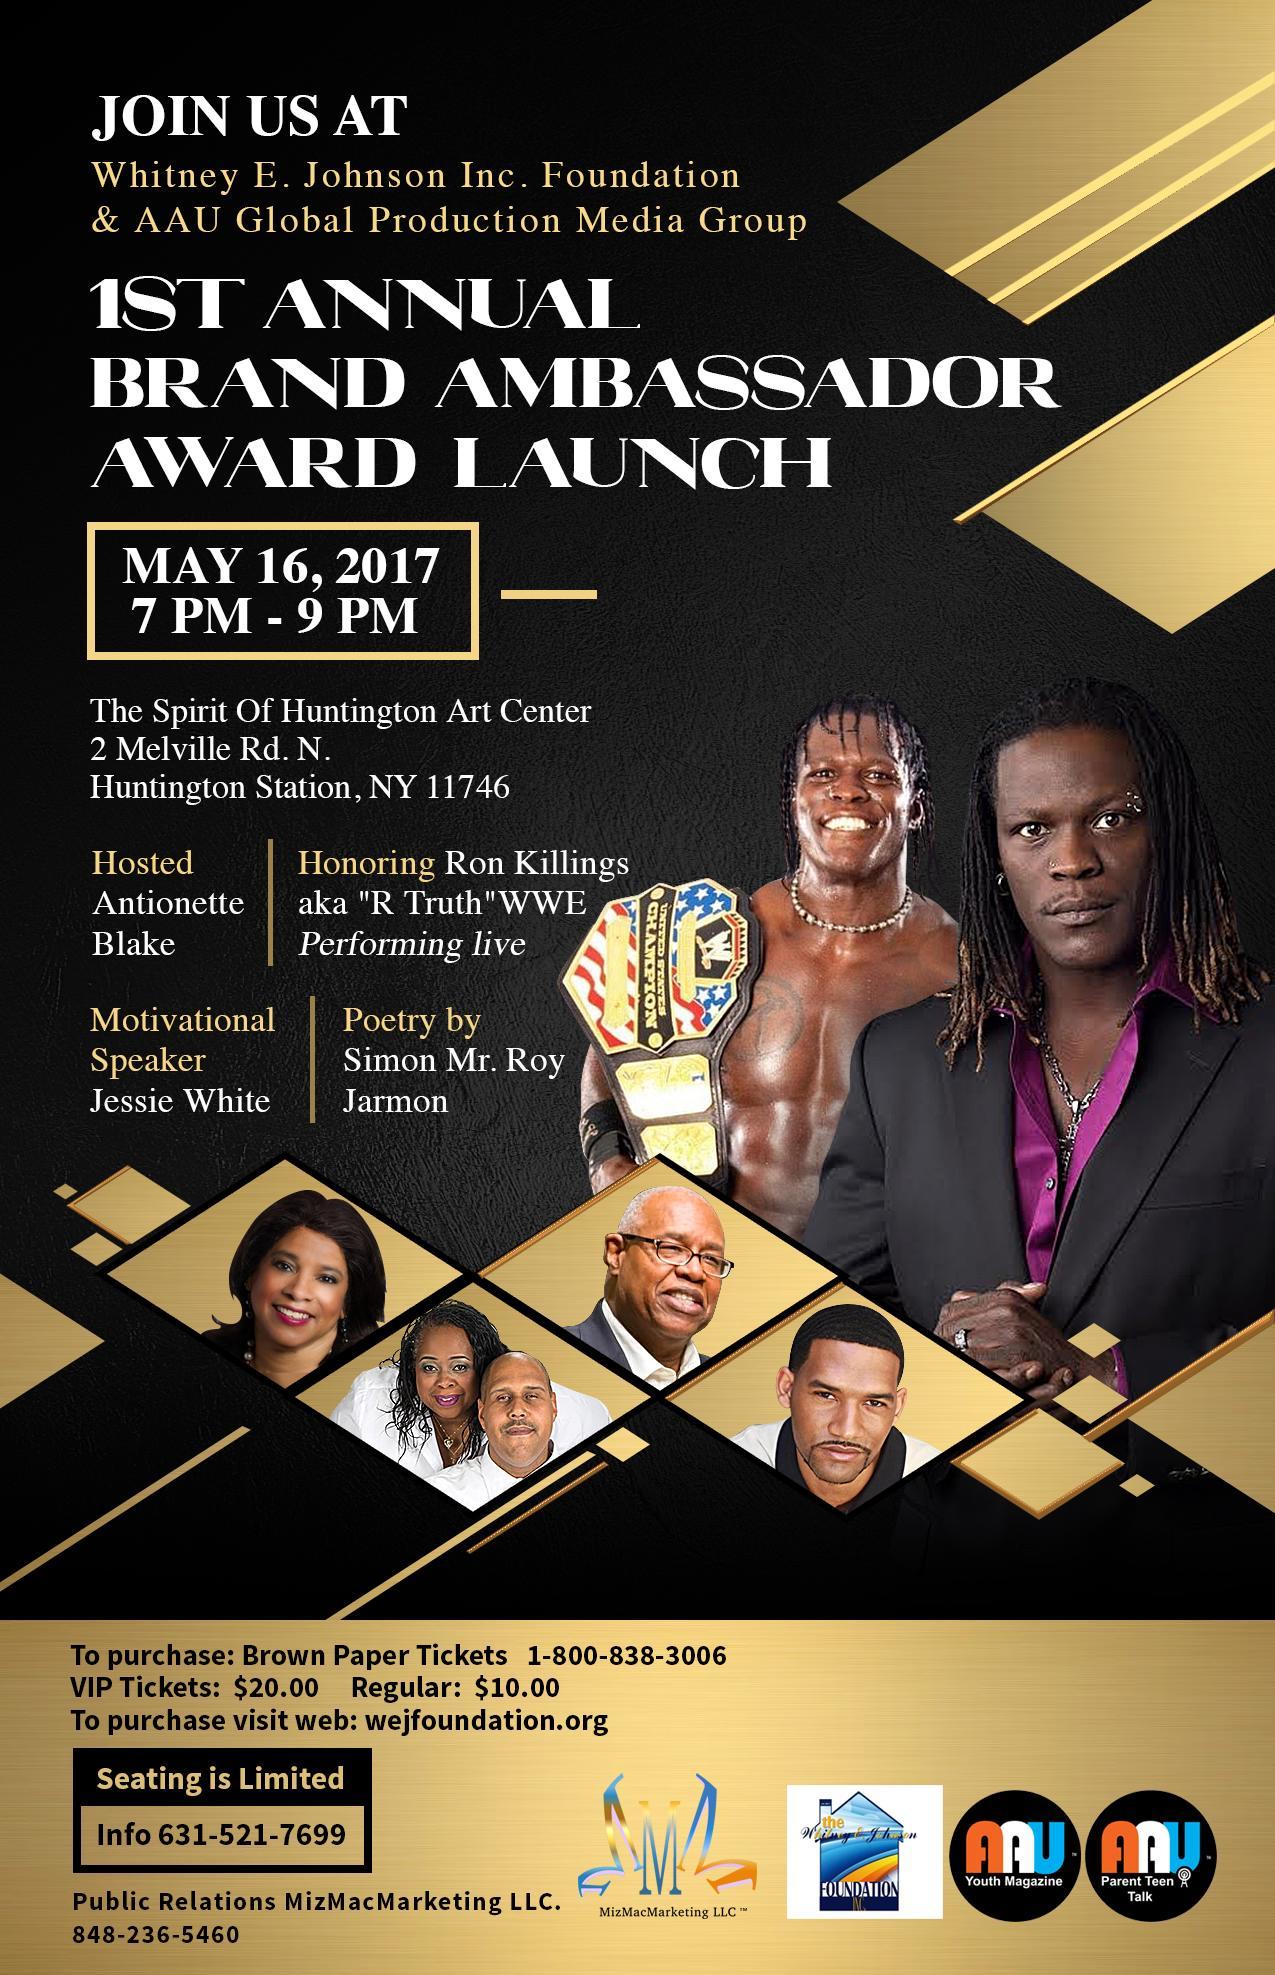 1st Annual Brand Ambassador Award Ceremony